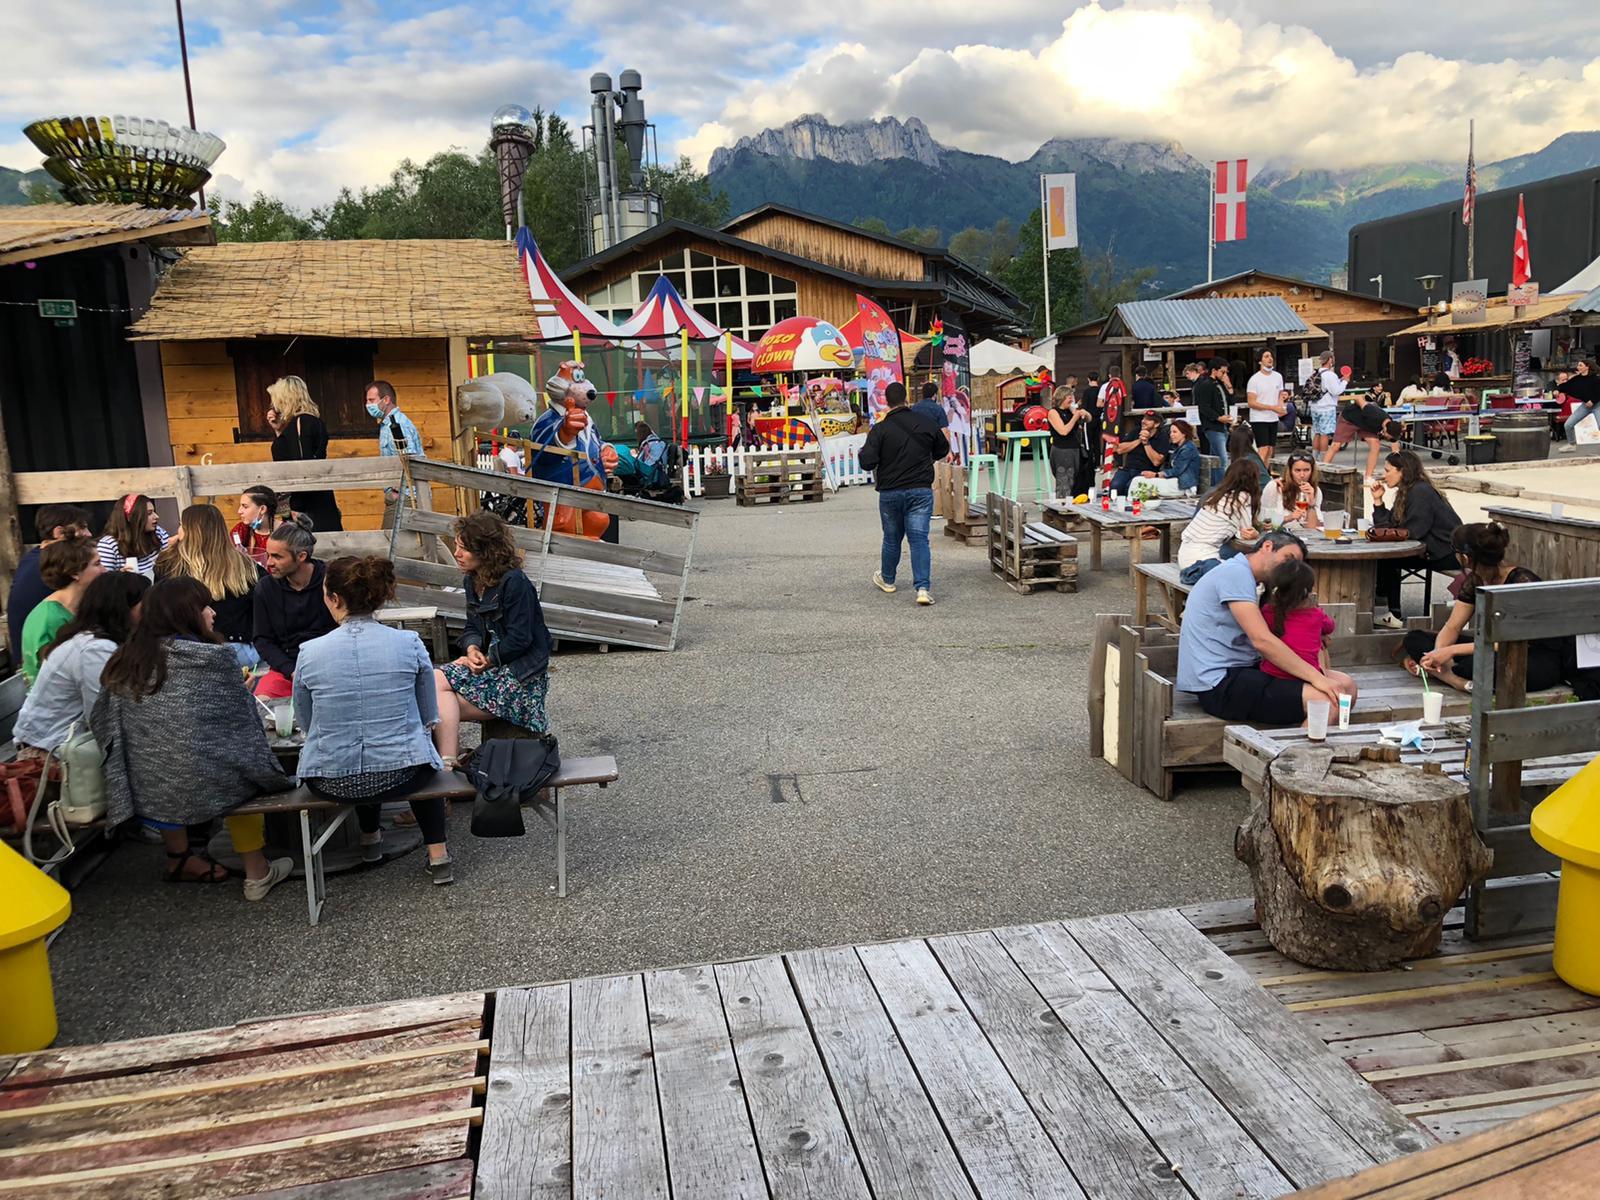 Loisirs à la Seiche - Sevrier - restaurant - bar - terrasse - shopping - Lac d'Annecy